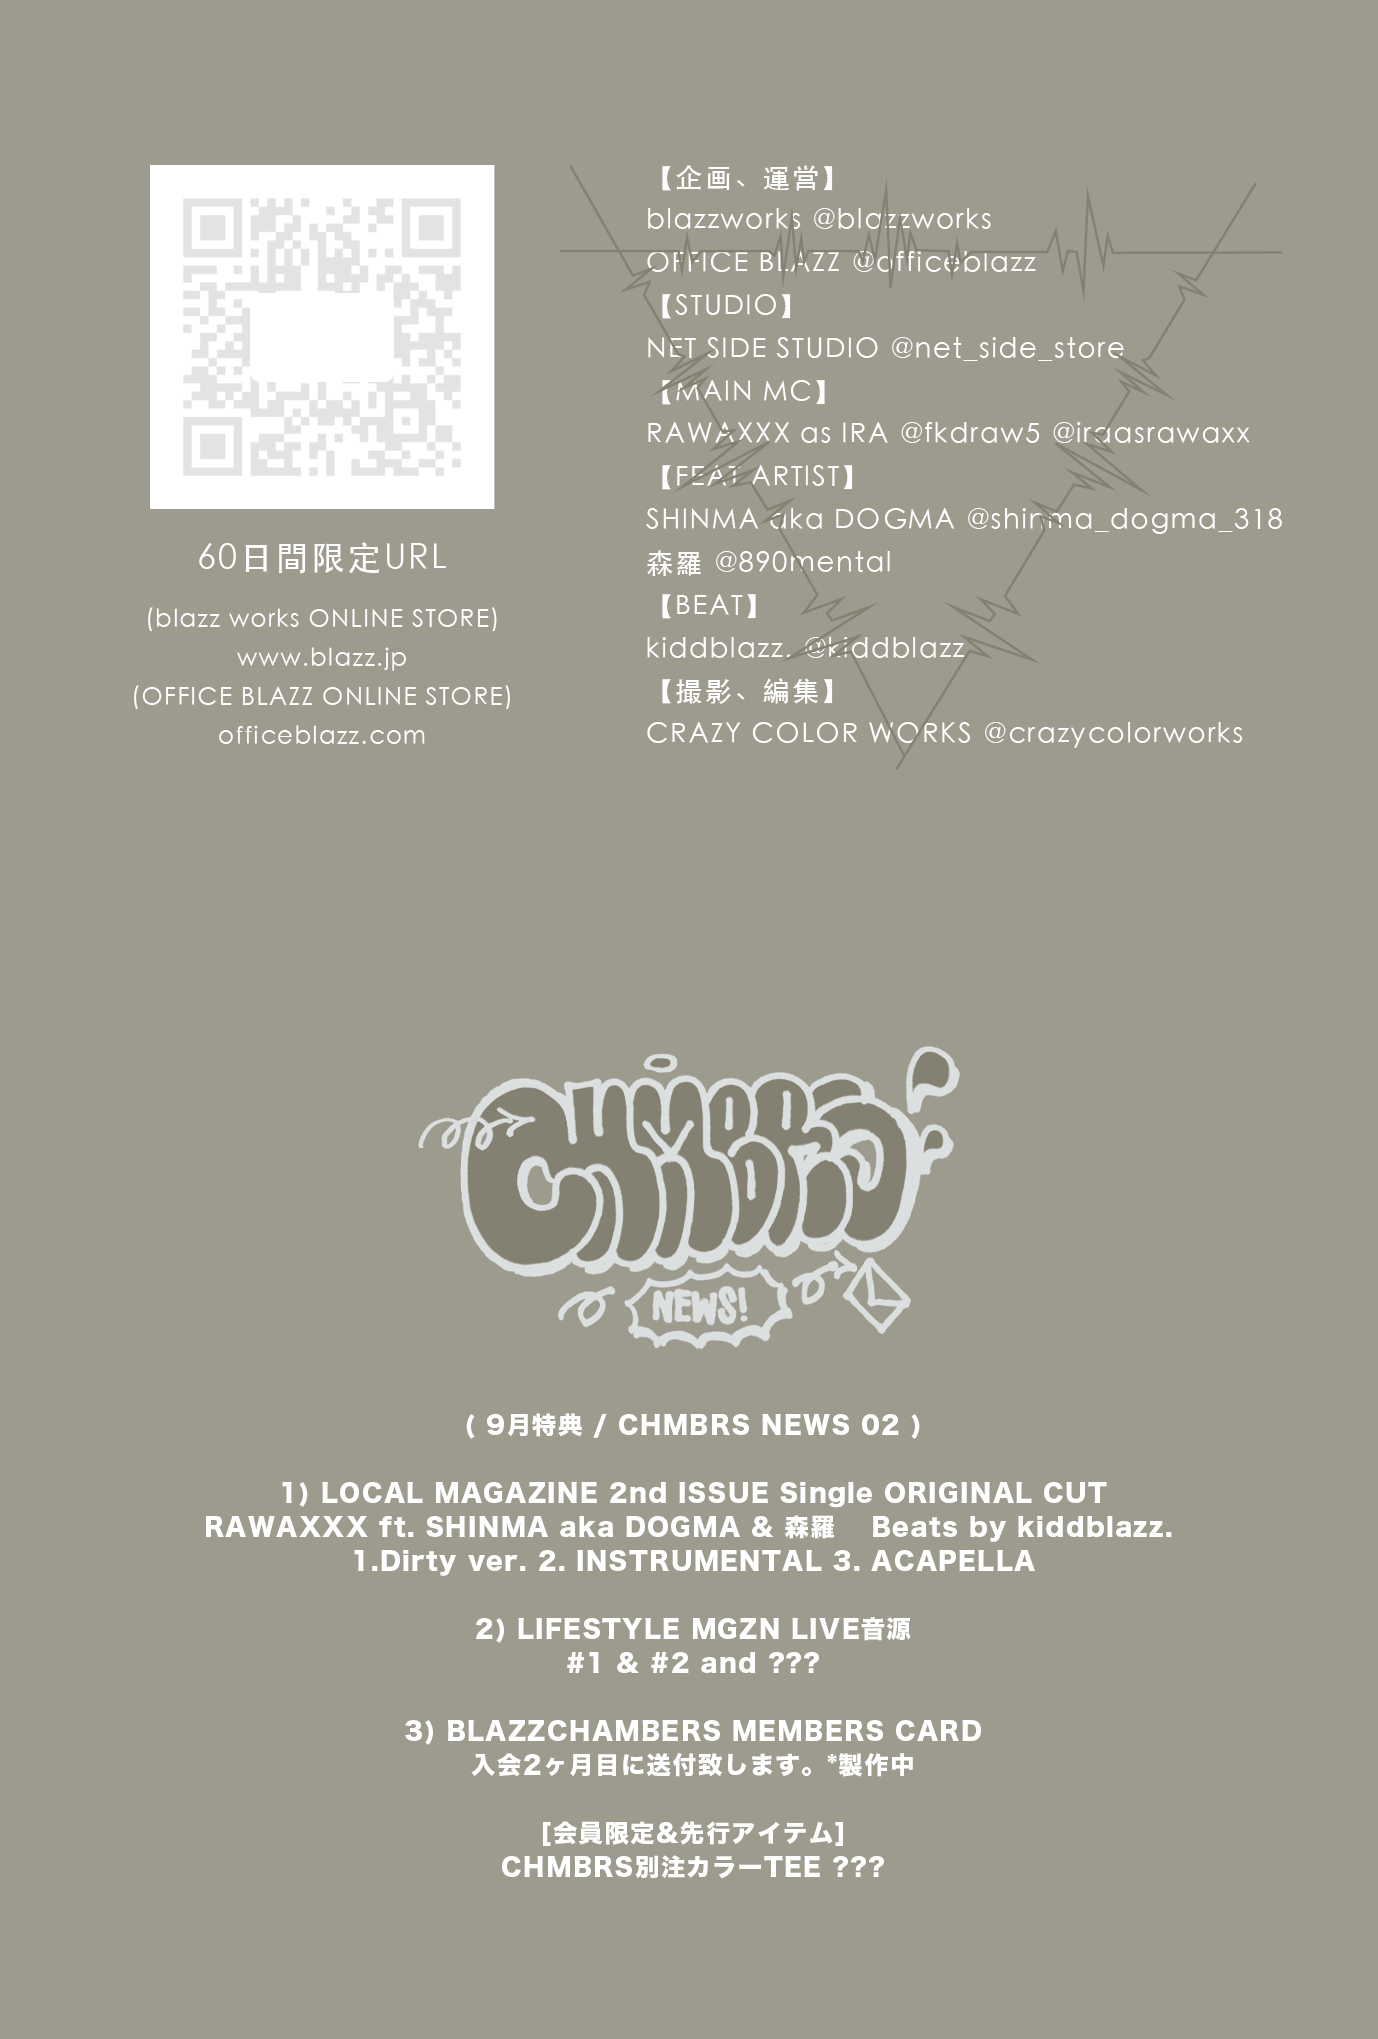 CHAMBERS NEWS 02 配信!!